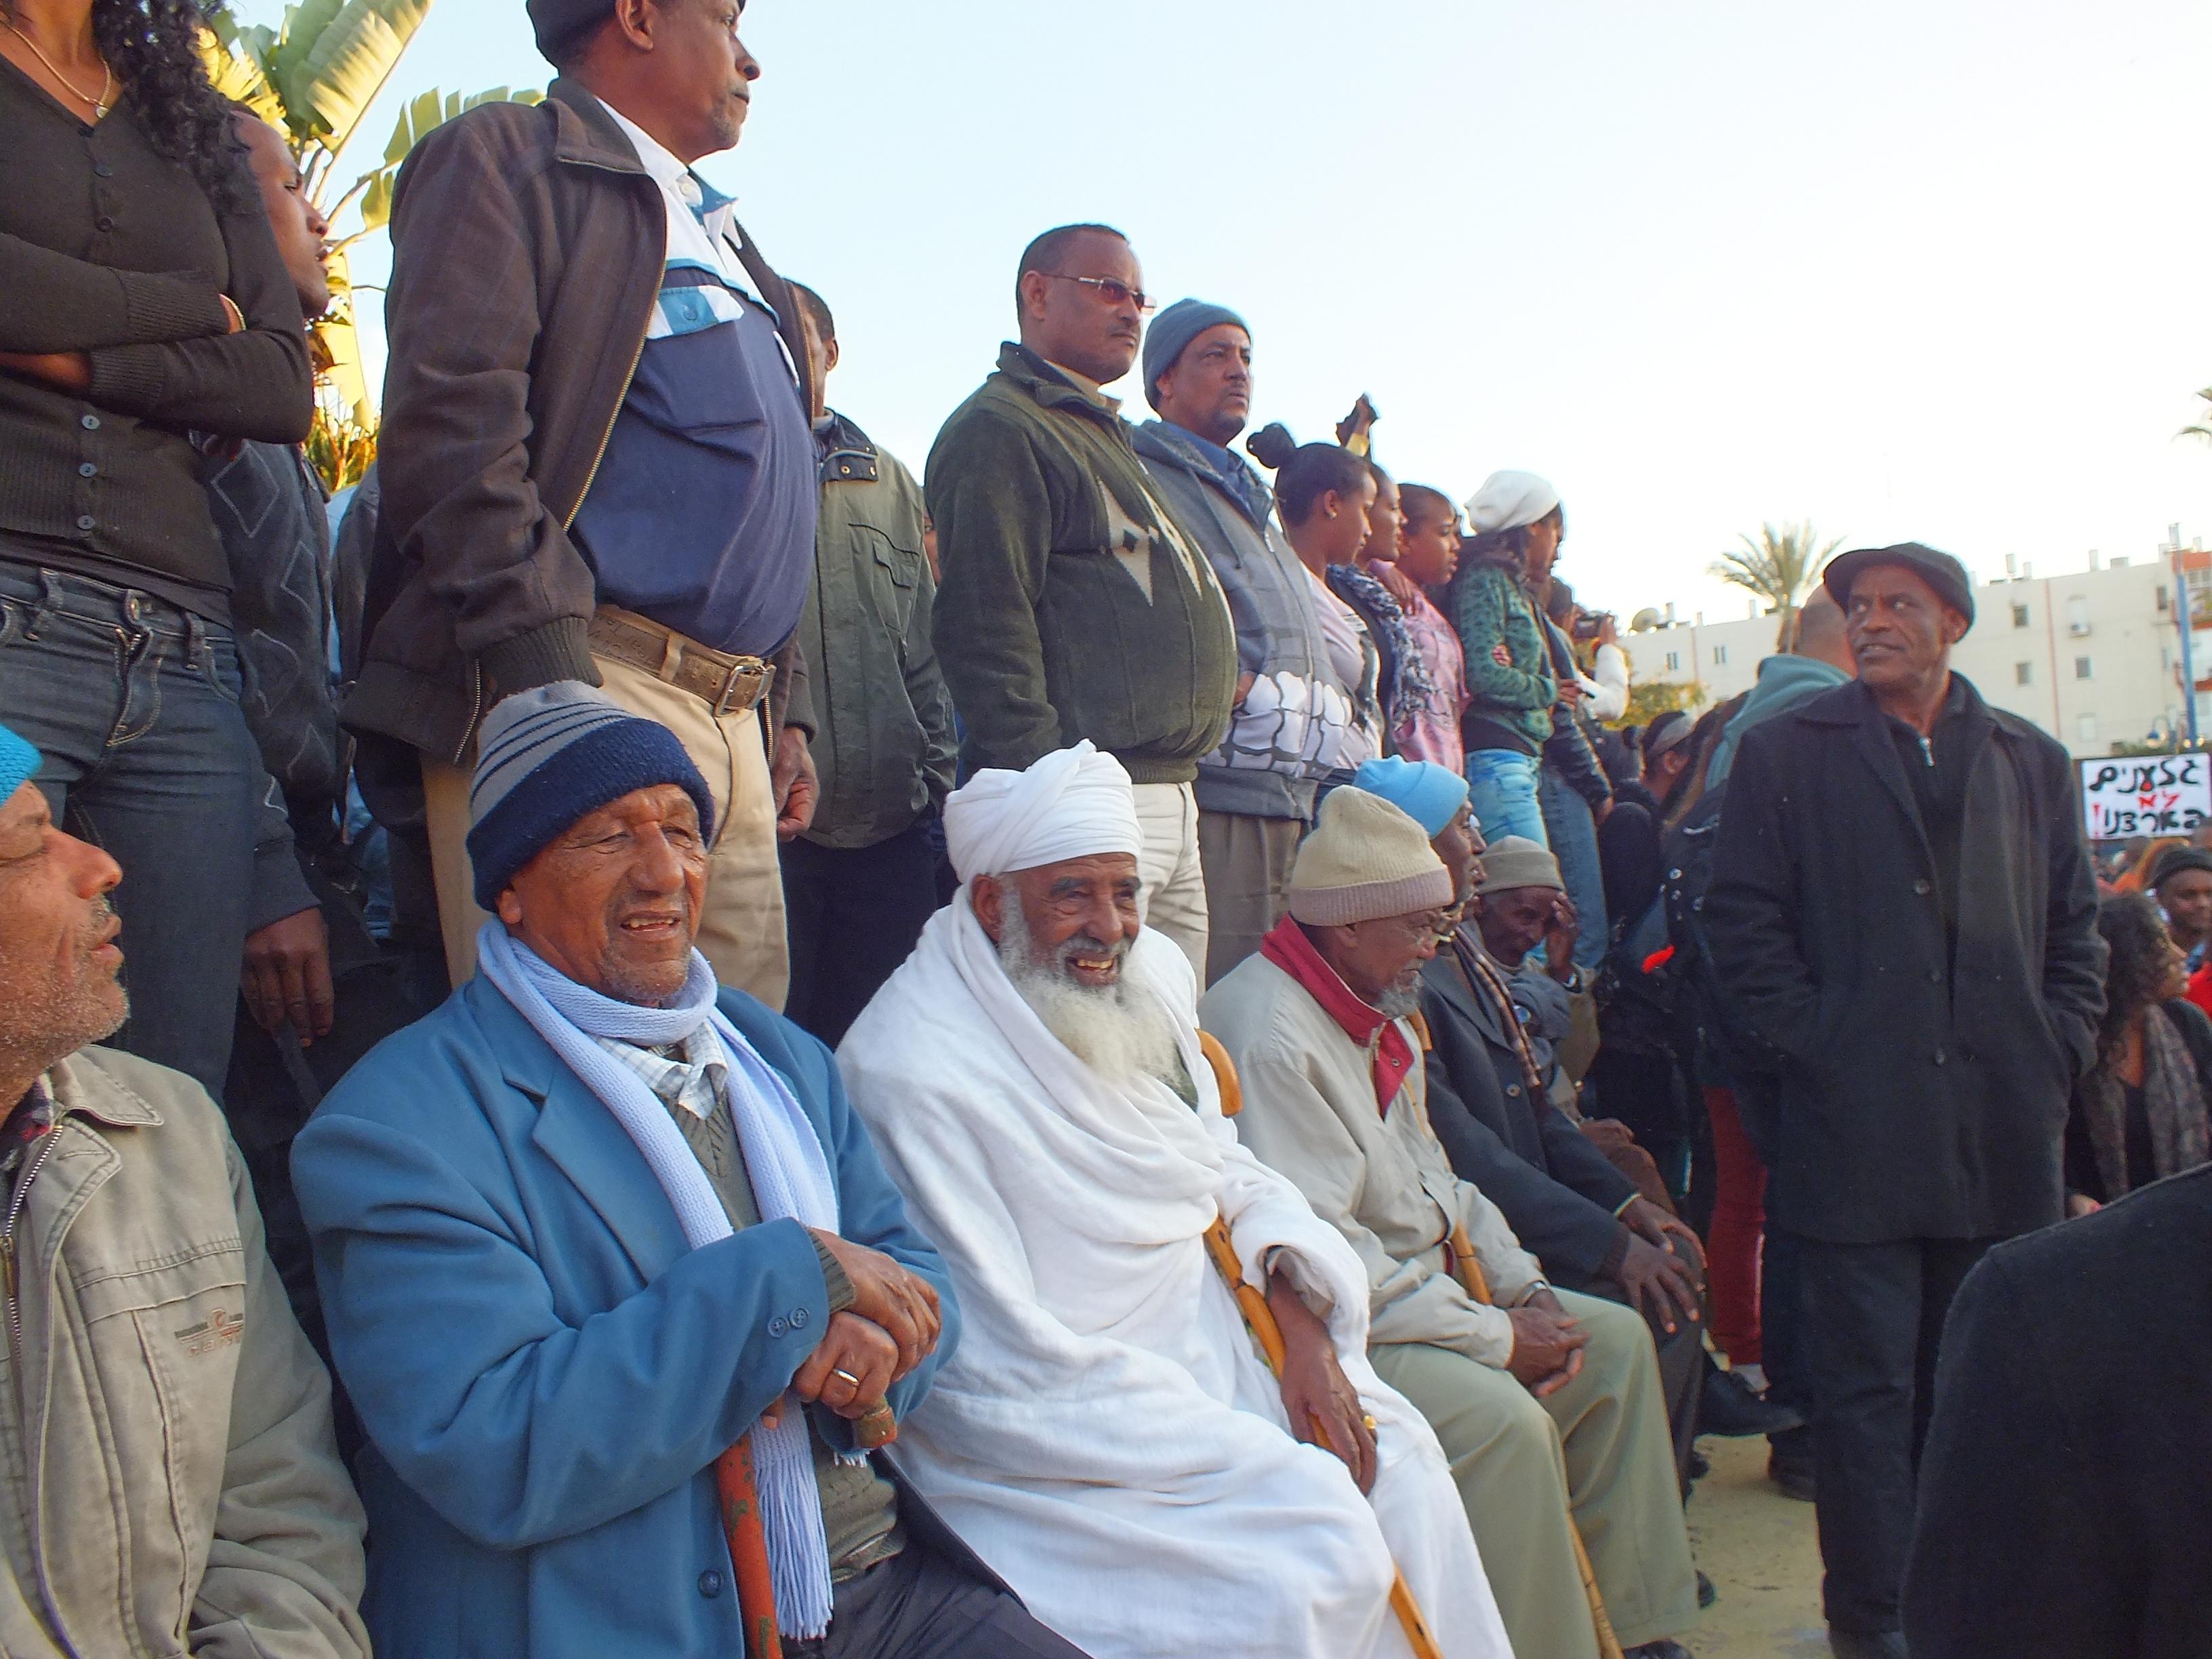 Ethiopian men dating austin